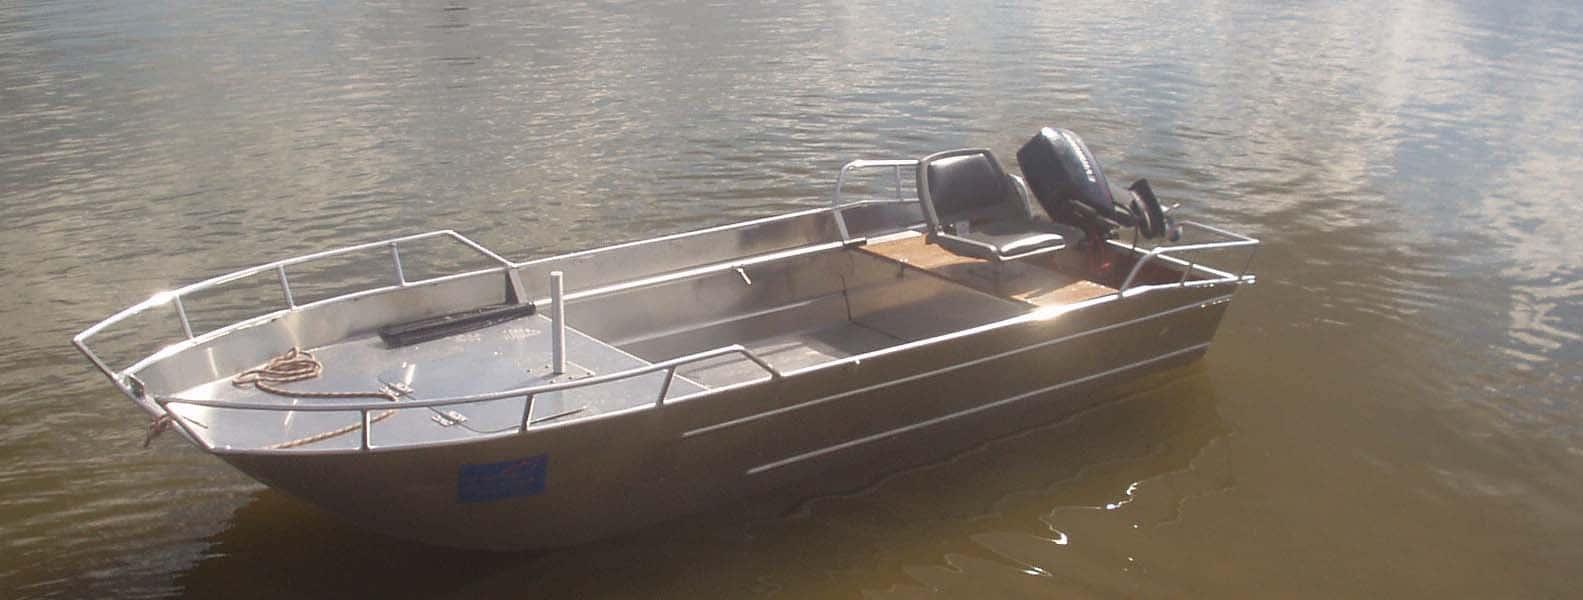 small-boat